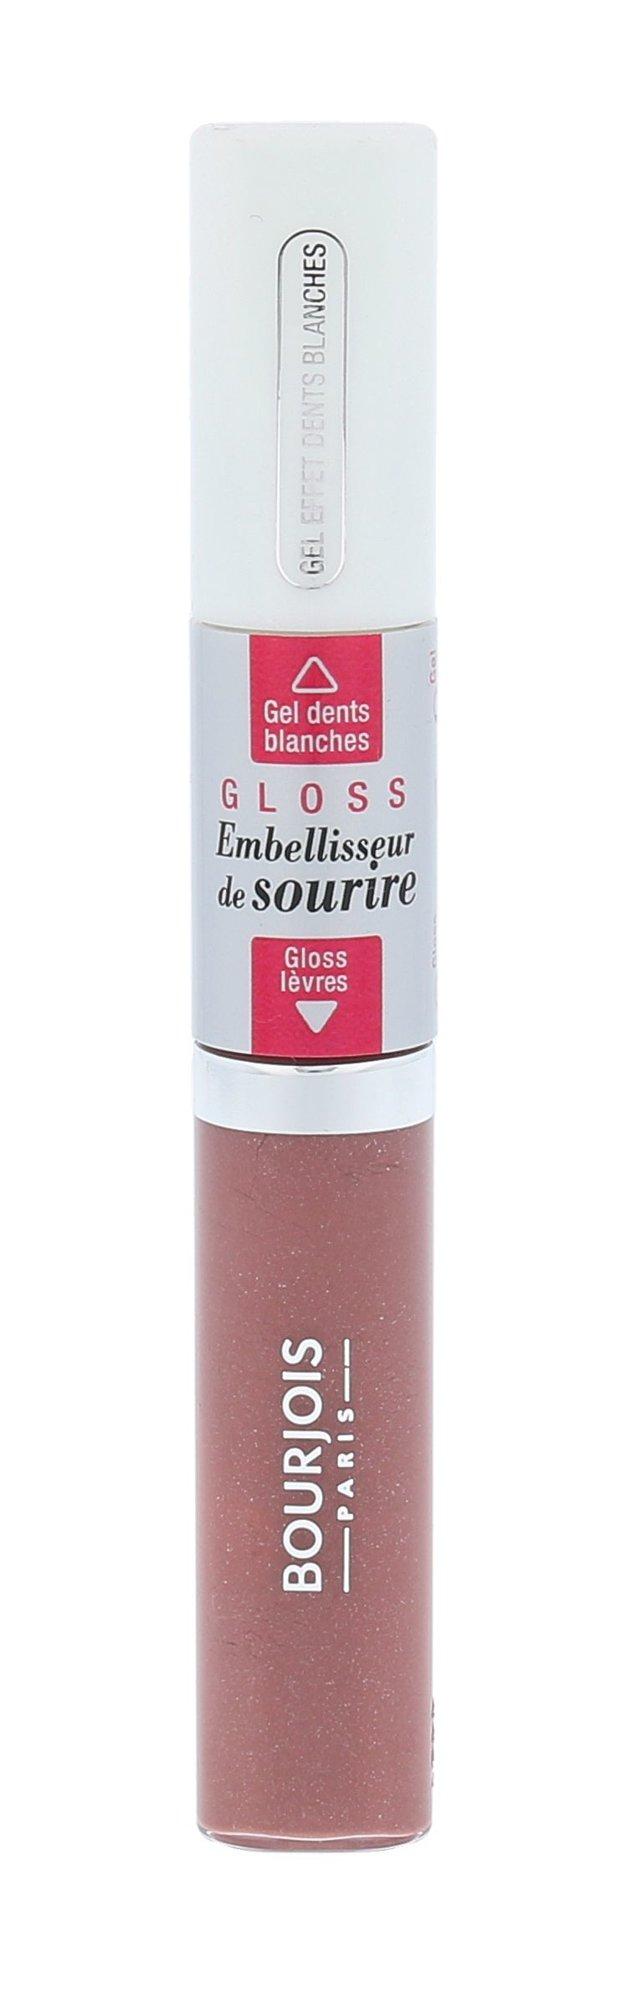 BOURJOIS Paris Smile Enhancing Cosmetic 7,5ml 06 Brown Showbiz